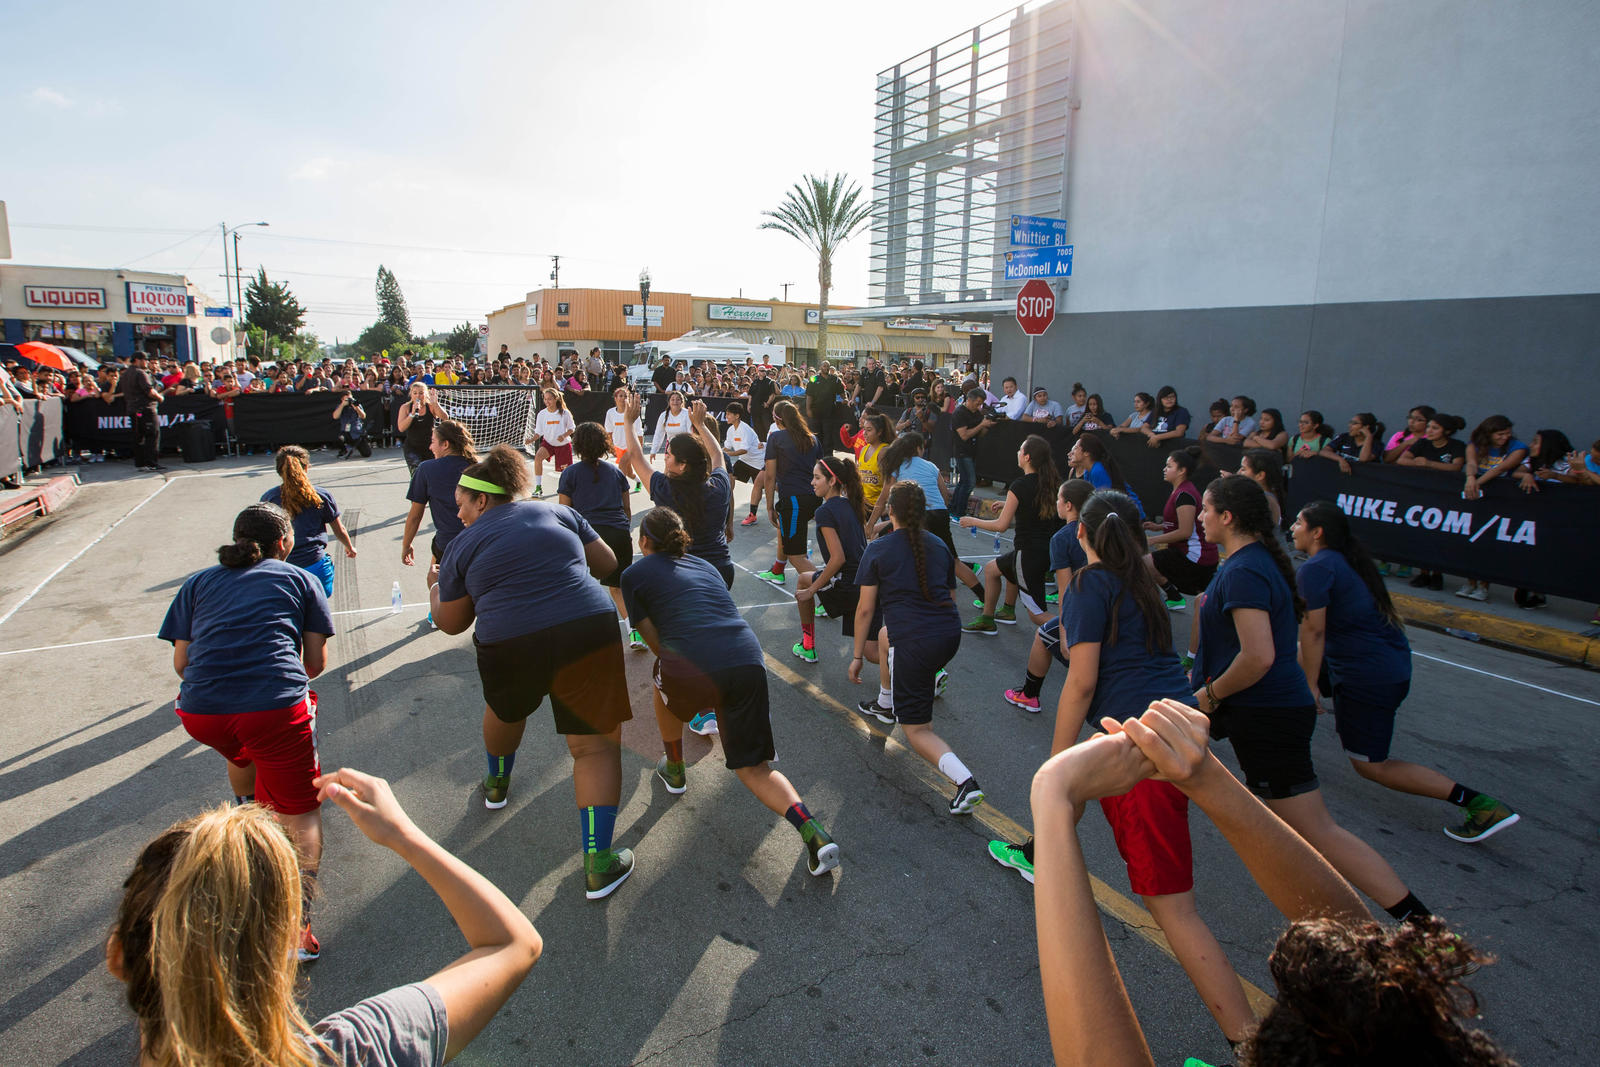 Nike Community Store East La